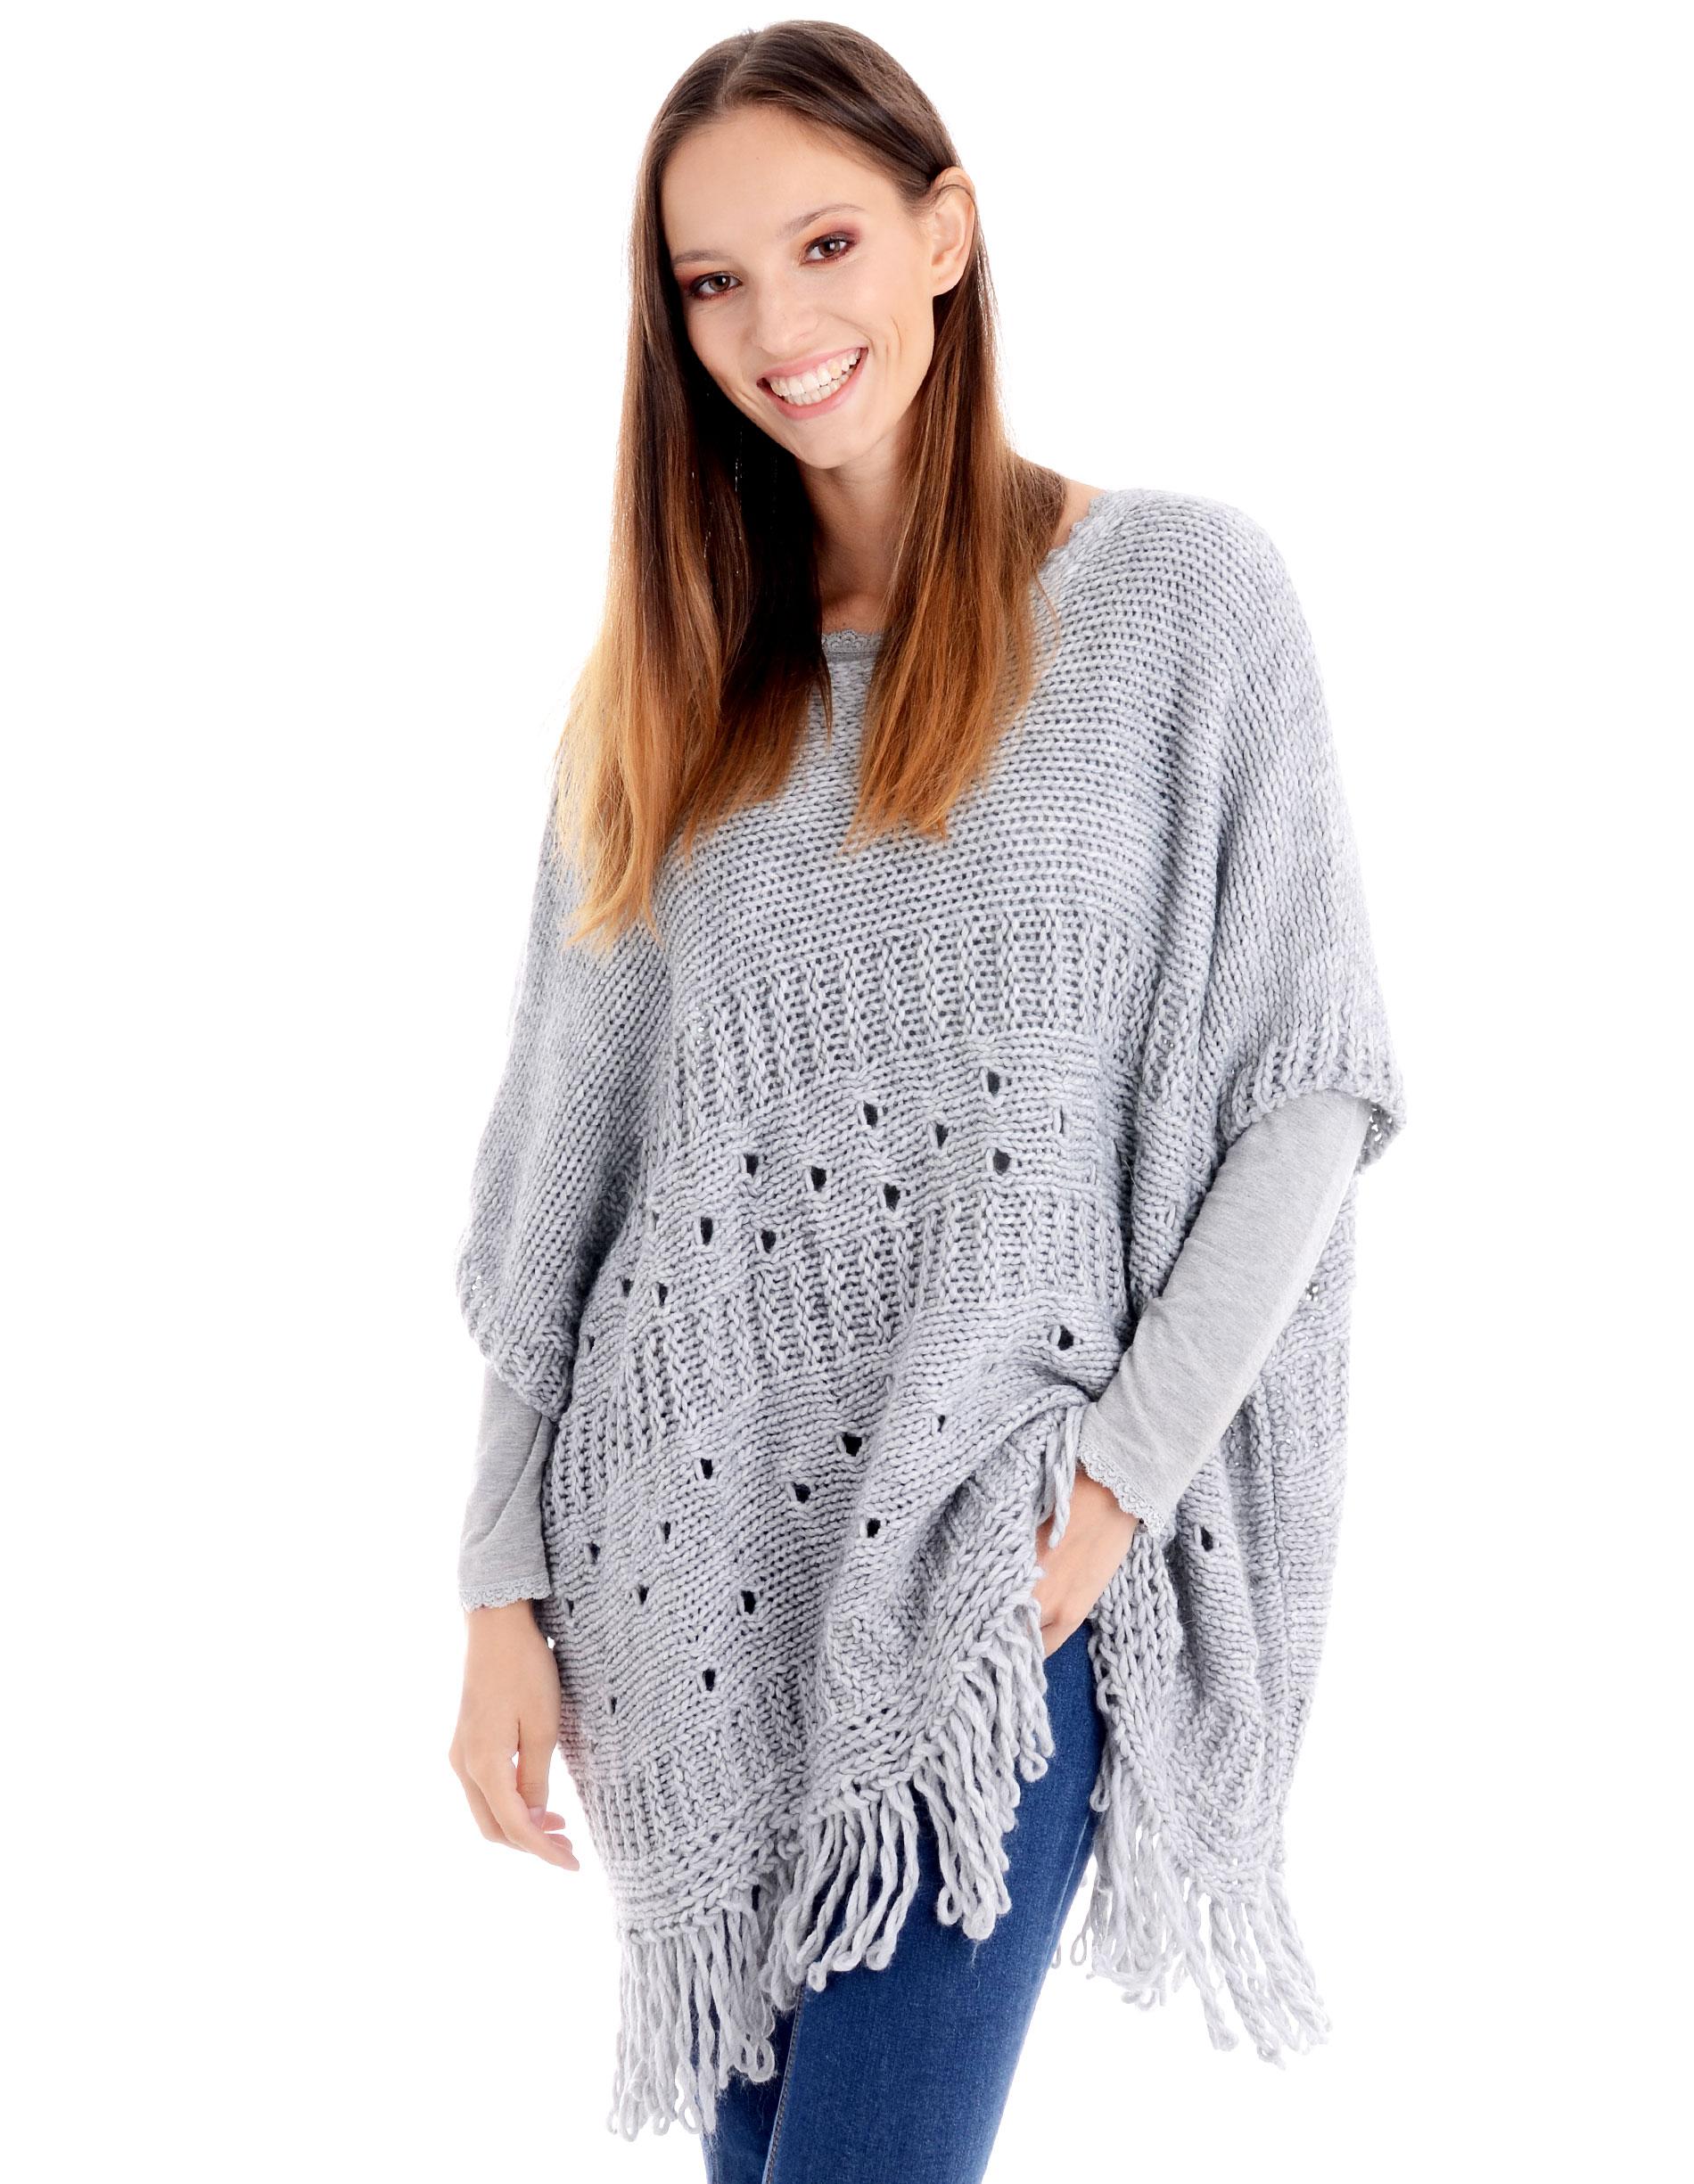 Sweter - 67-15632 GRCH - Unisono